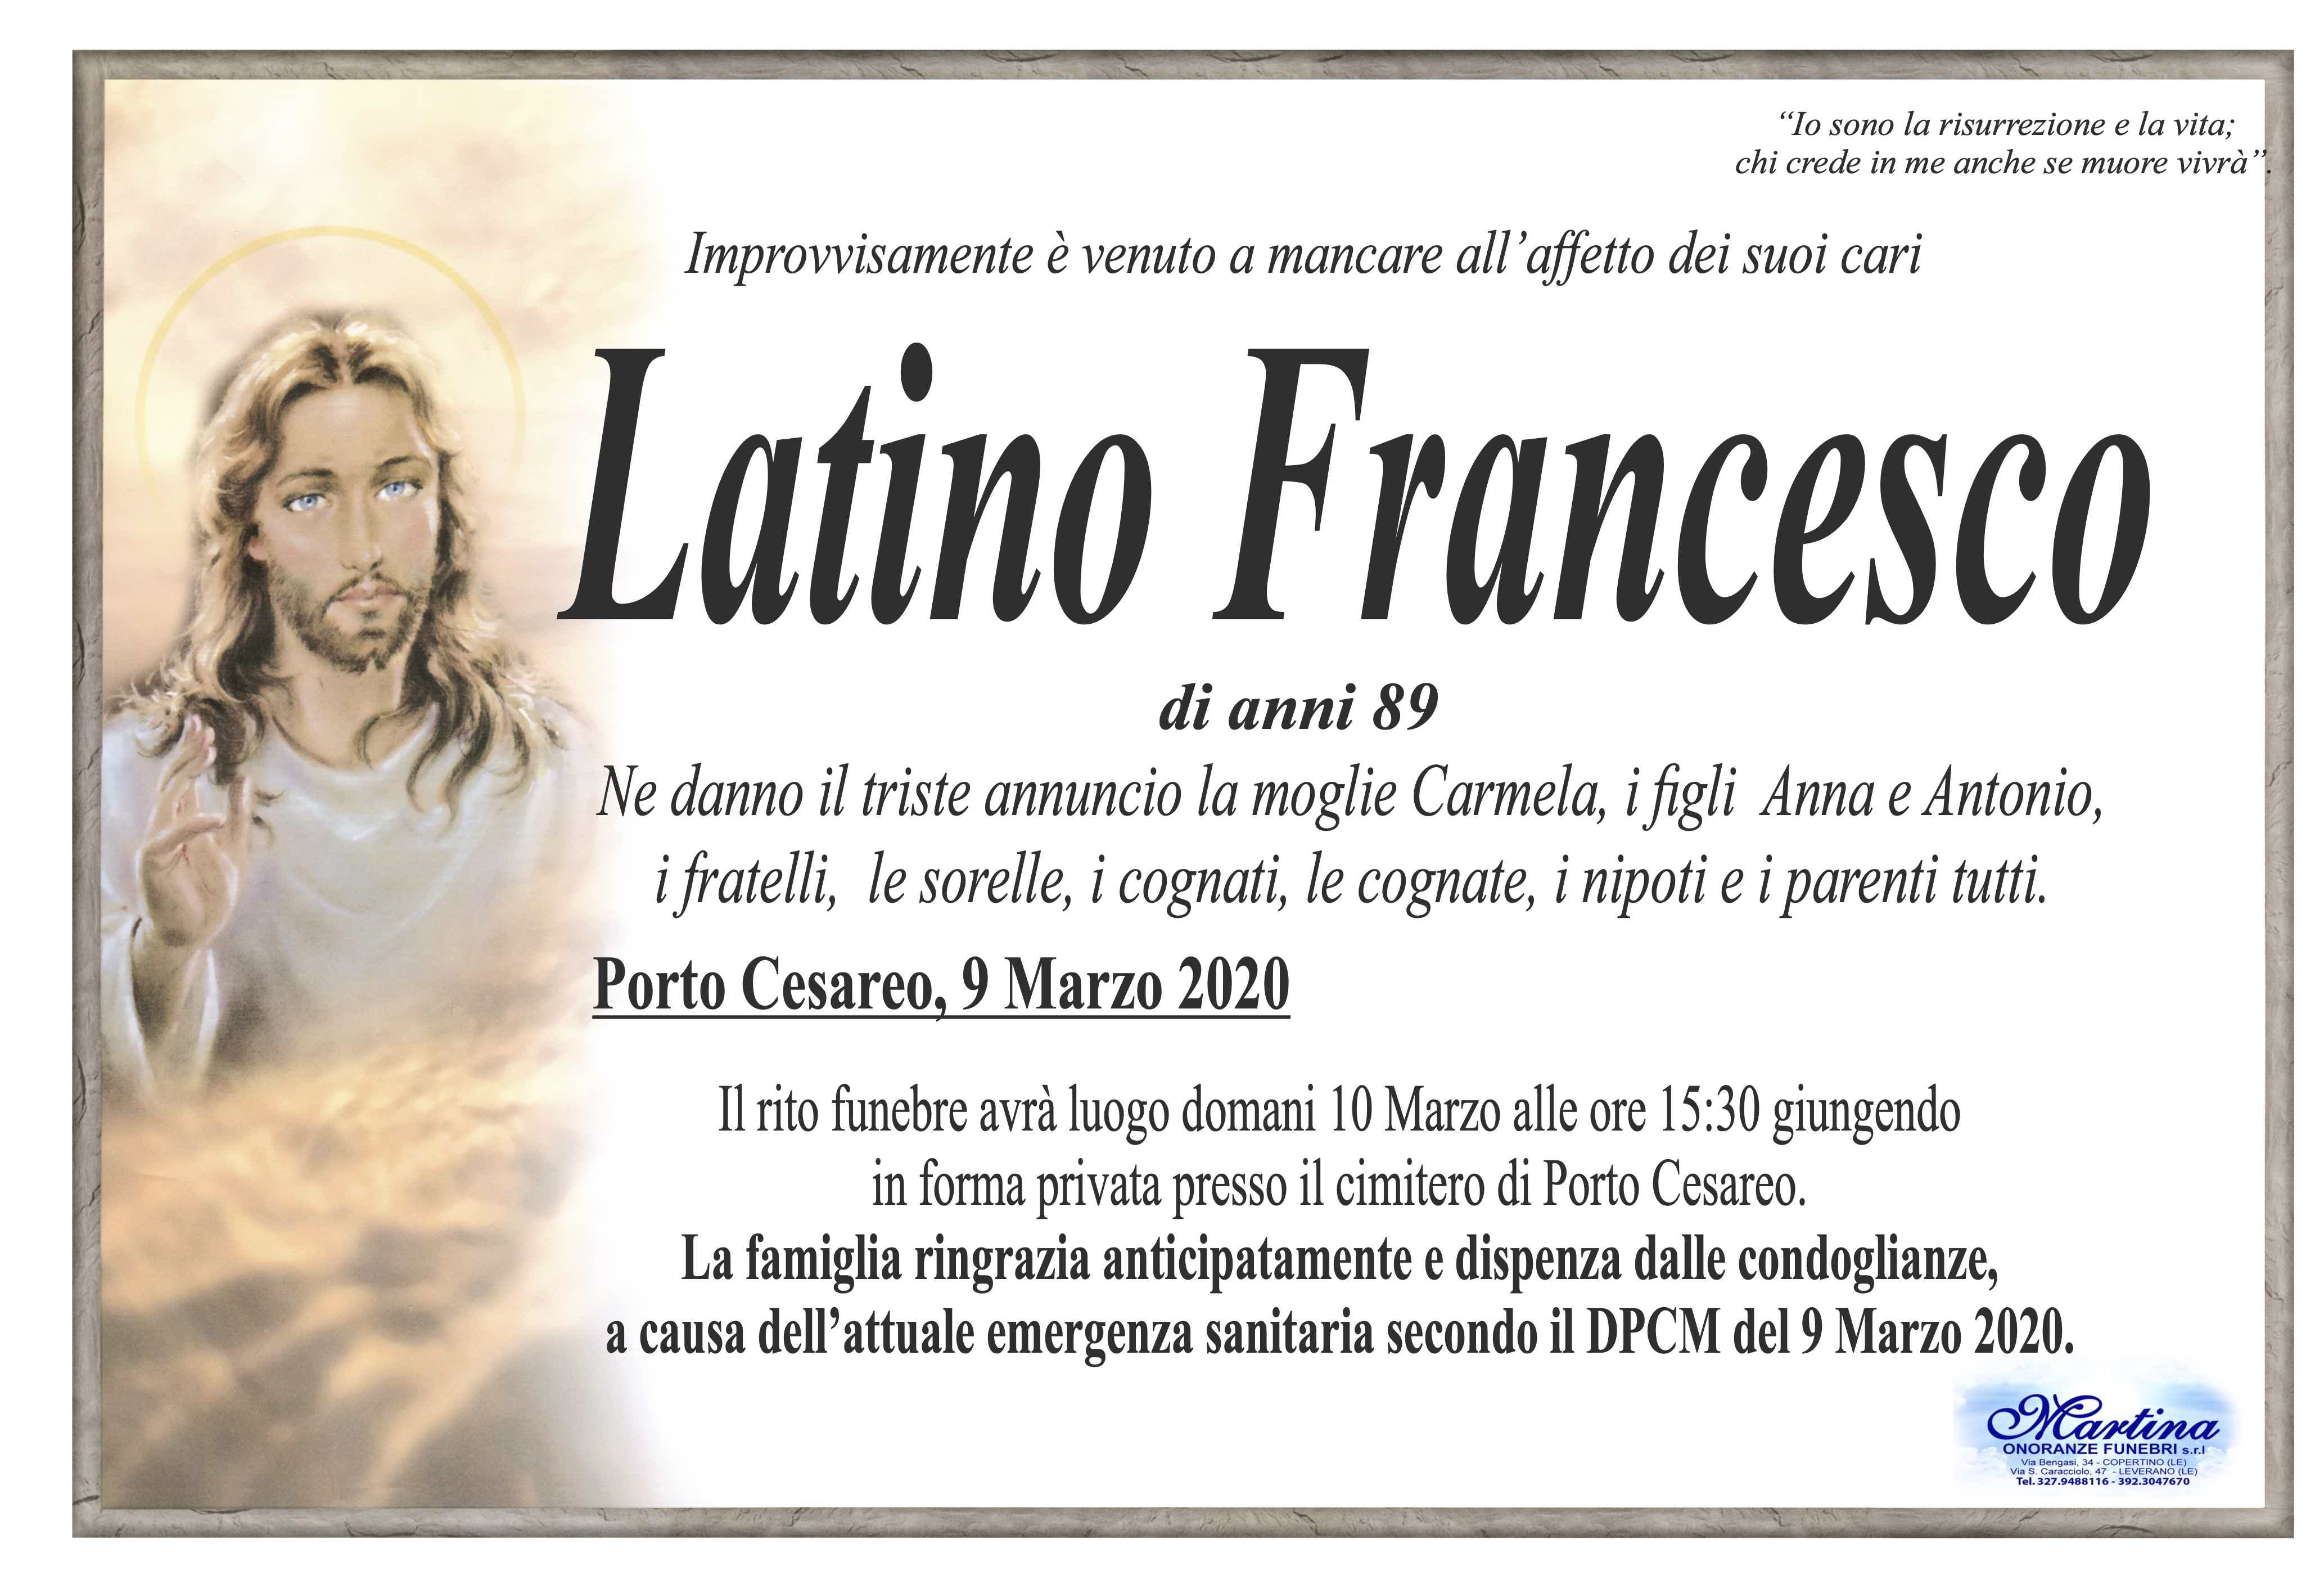 Francesco Latino